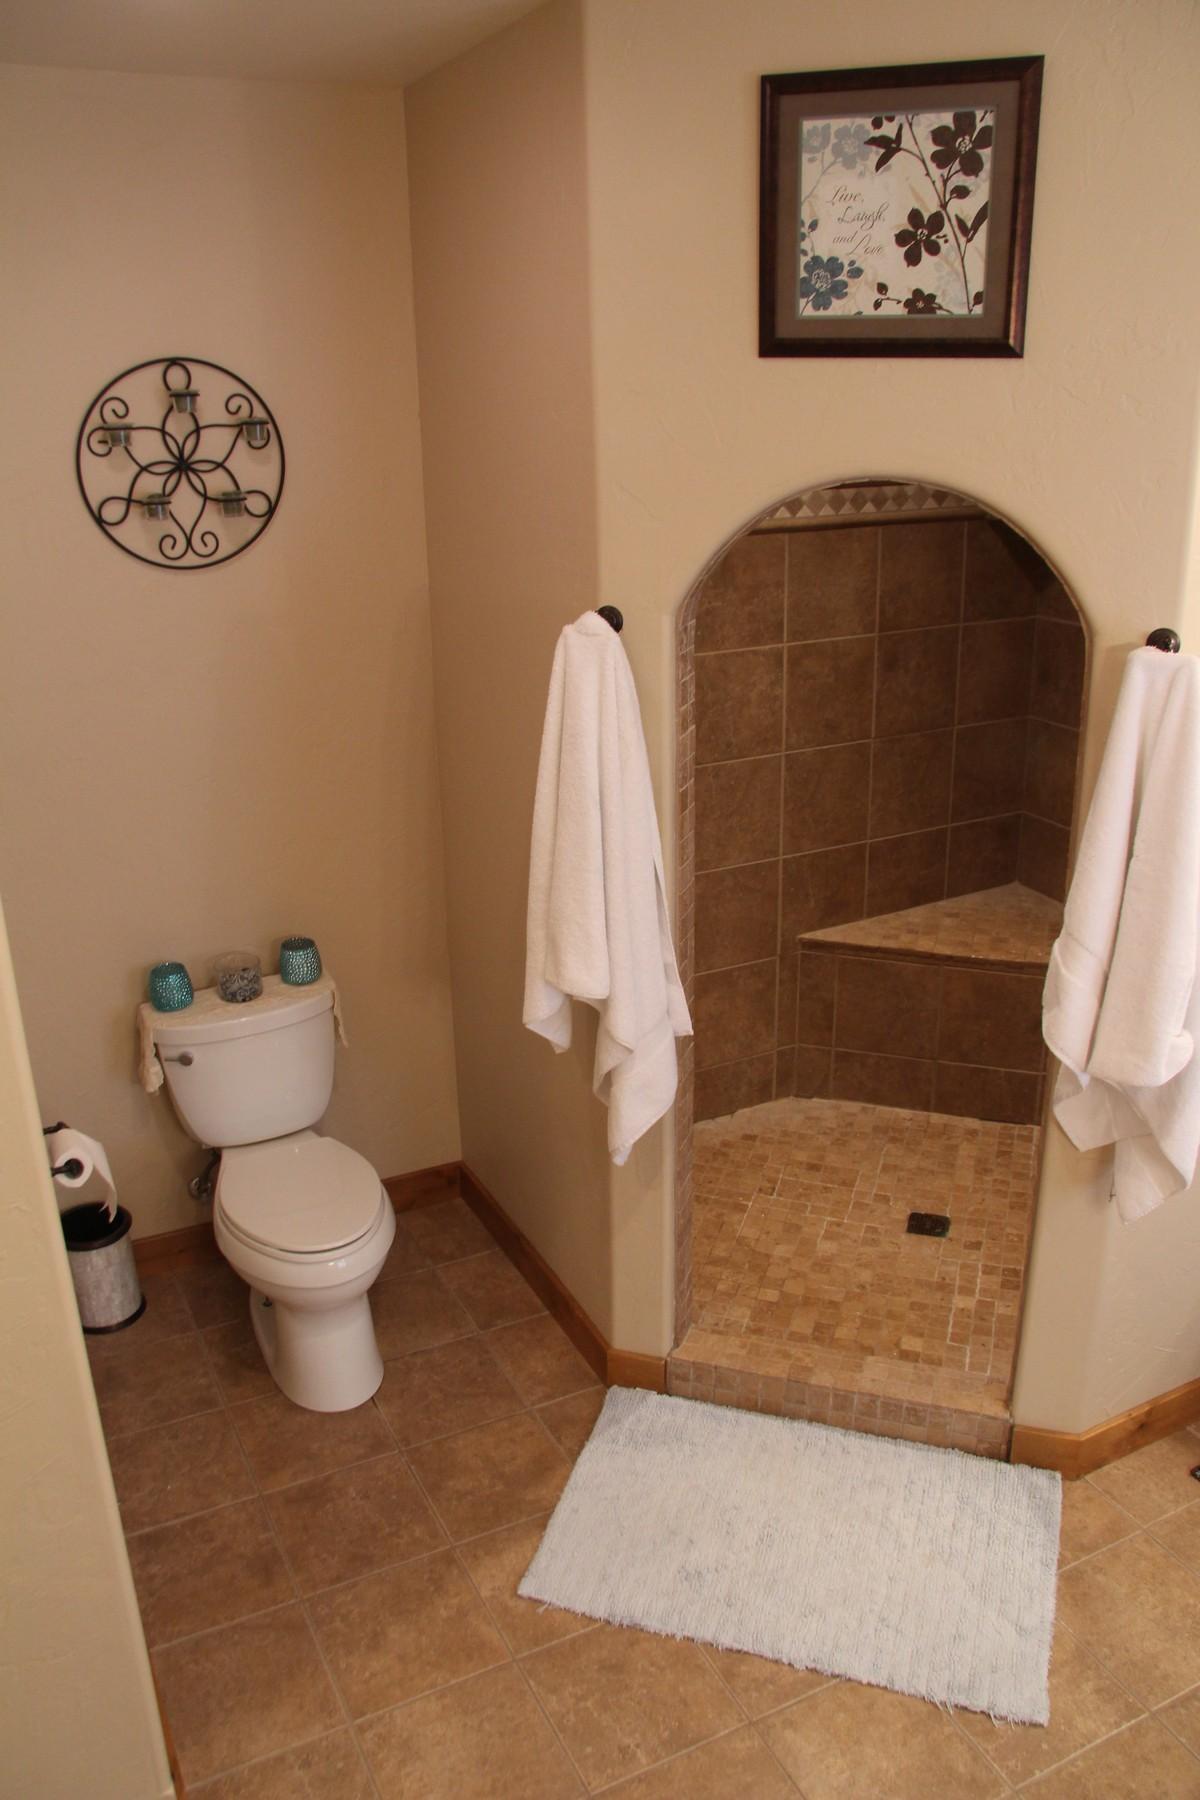 Additional photo for property listing at 1000 Kienas Rd 1000  Kienas Rd  N Kalispell, Montana 59901 United States